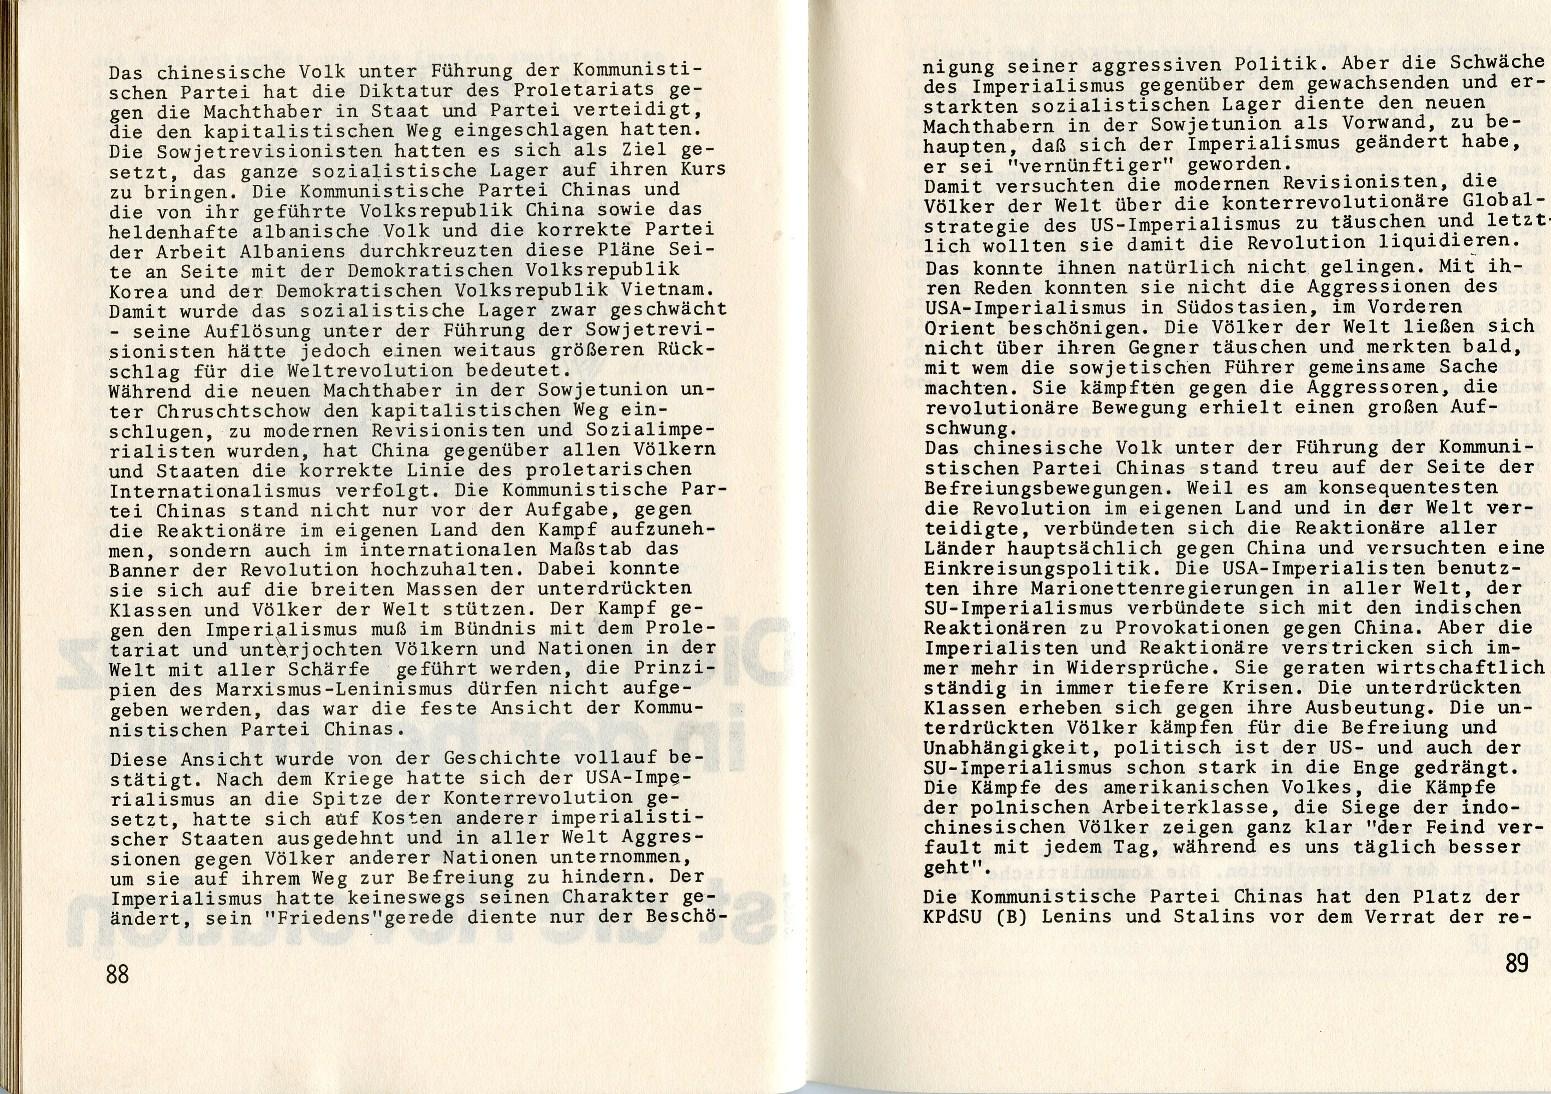 ZB_KPChinas_1971_46